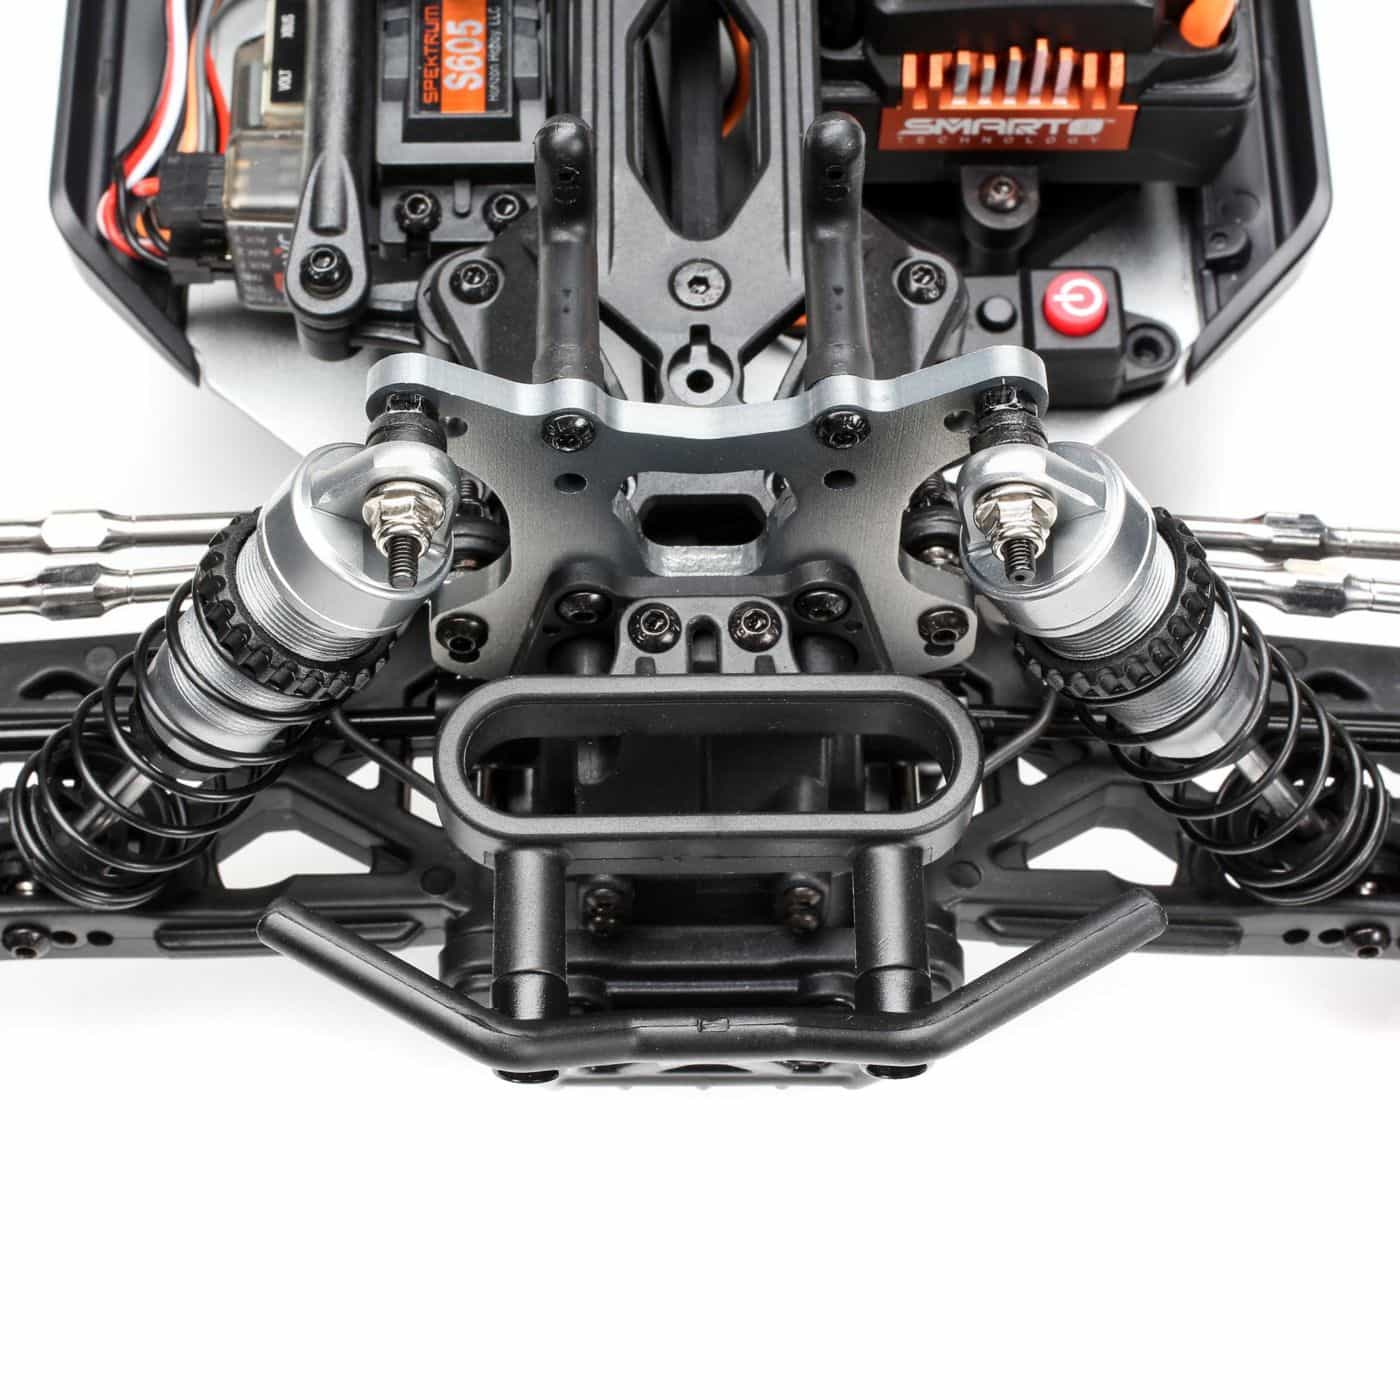 Losi Tenacity DB Pro - Suspension Detail